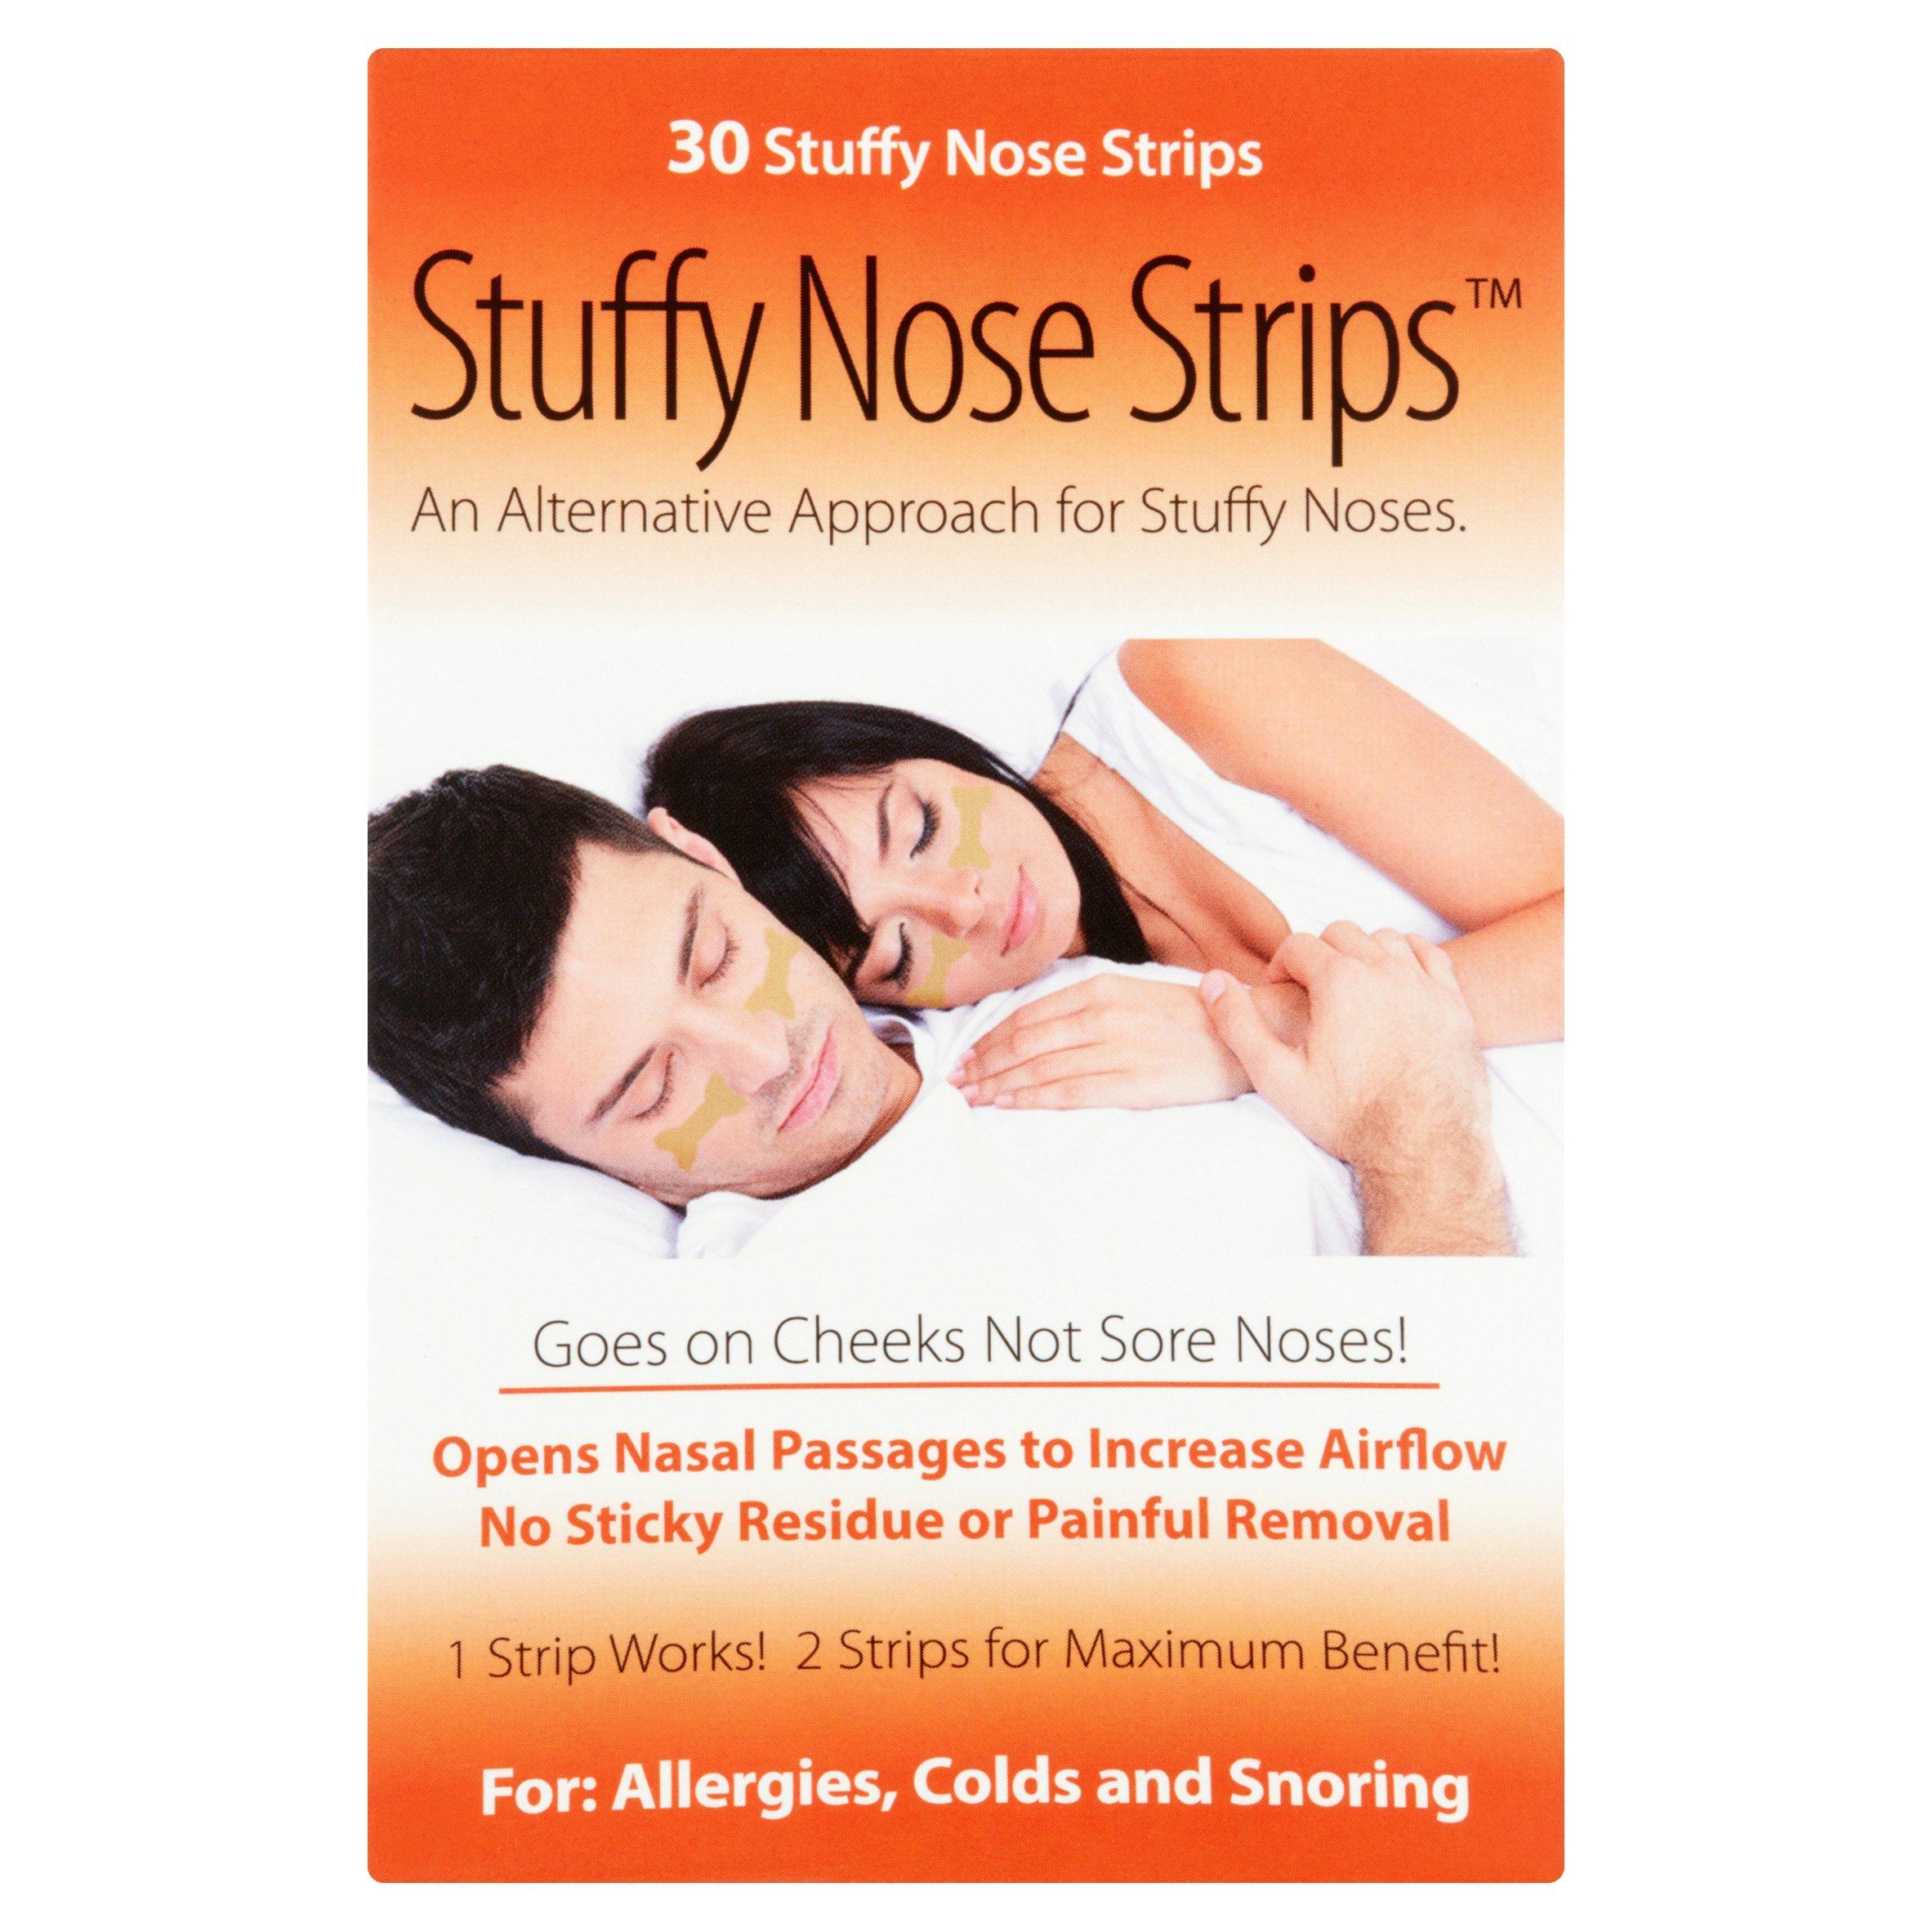 Stuffy Nose Strips Tan Strips, 30 count